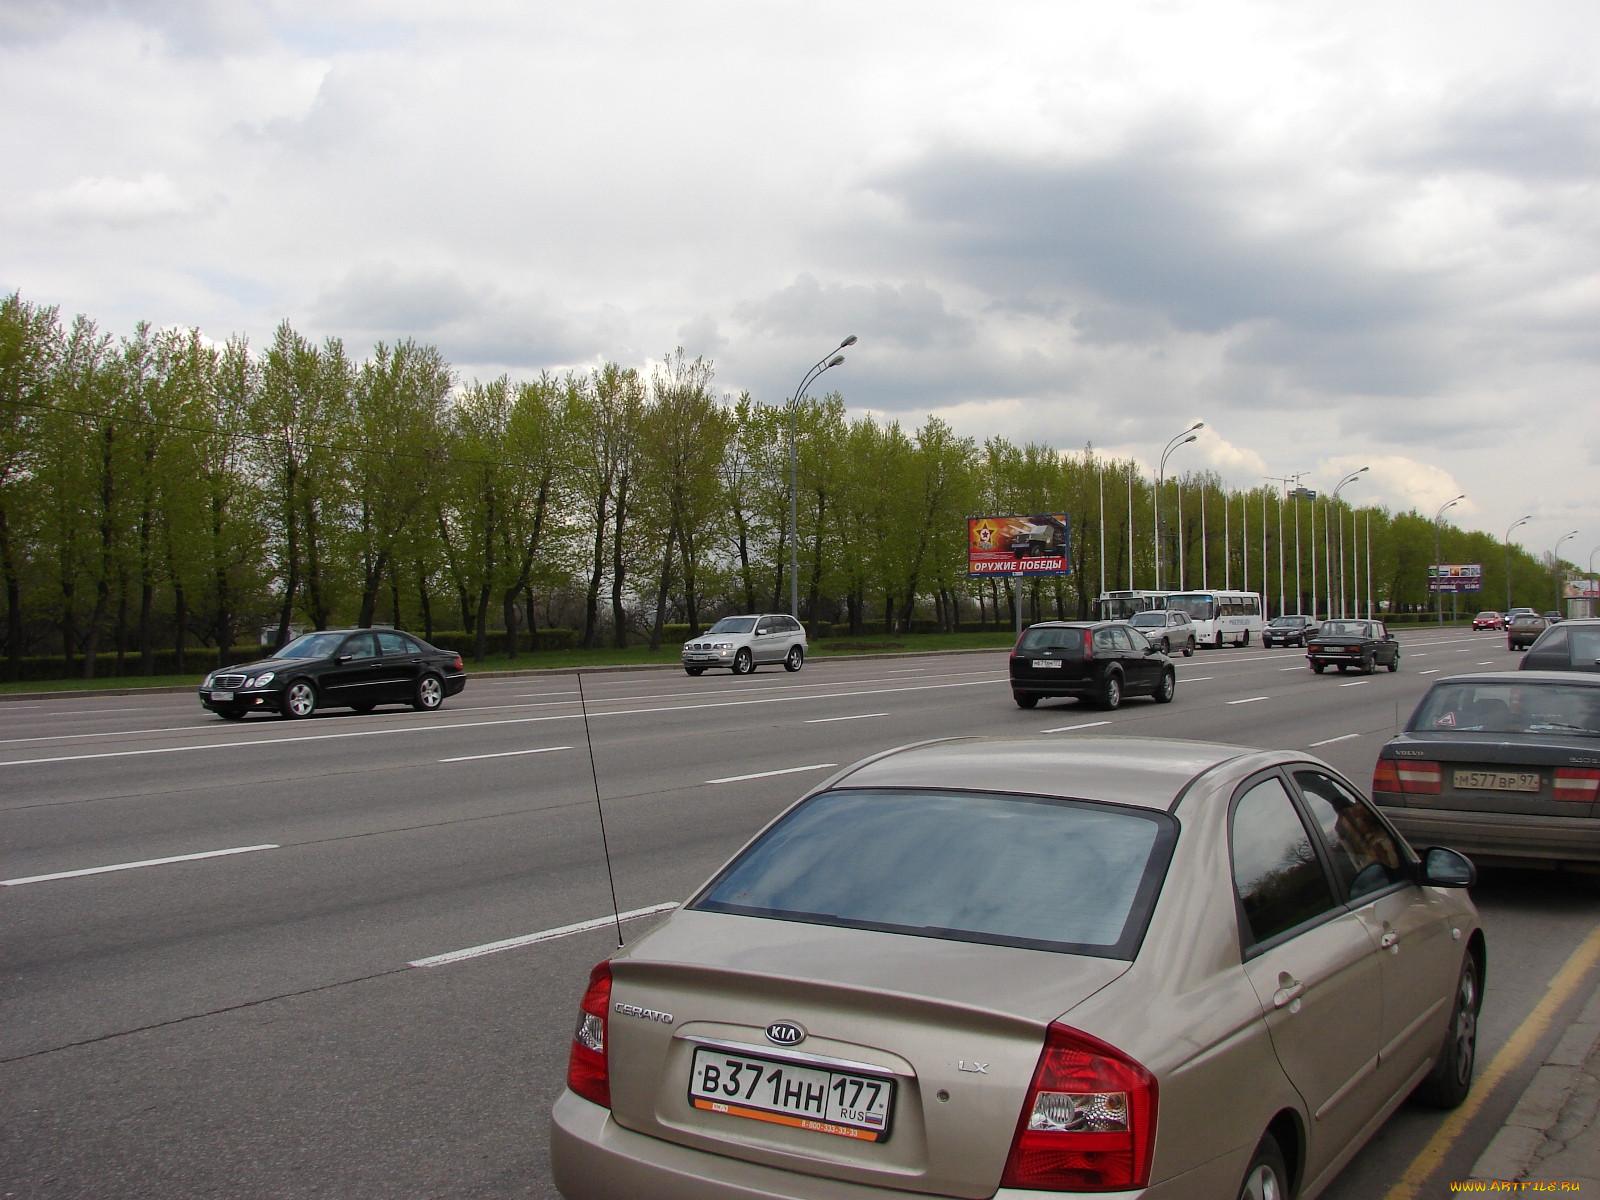 trans-avto-g-moskva-kutuzovskiy-prospekt-88